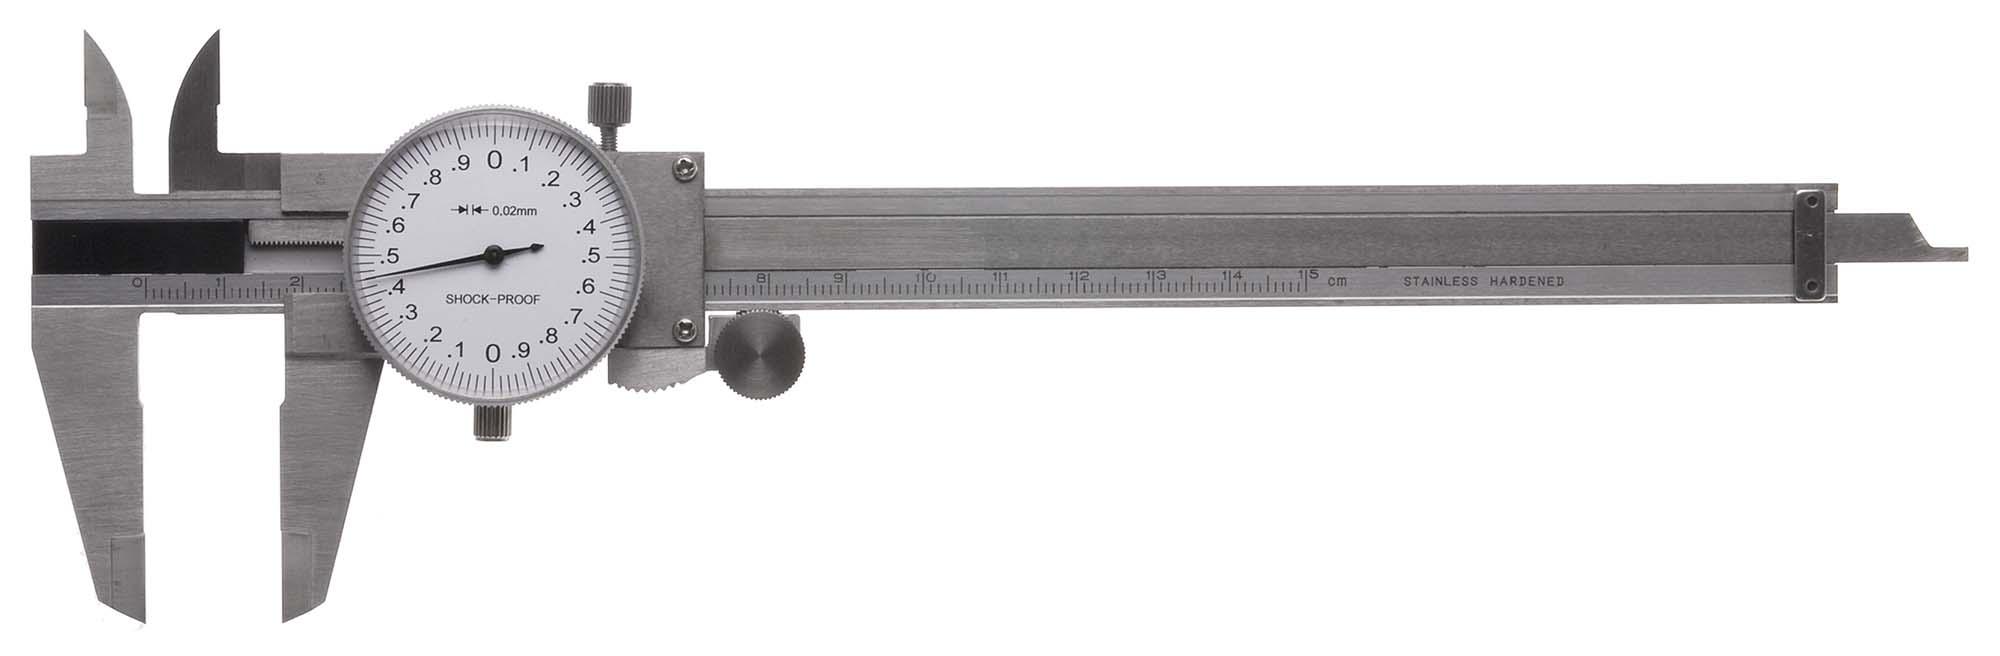 DCH-150MM  150mm Metric Dial Caliper